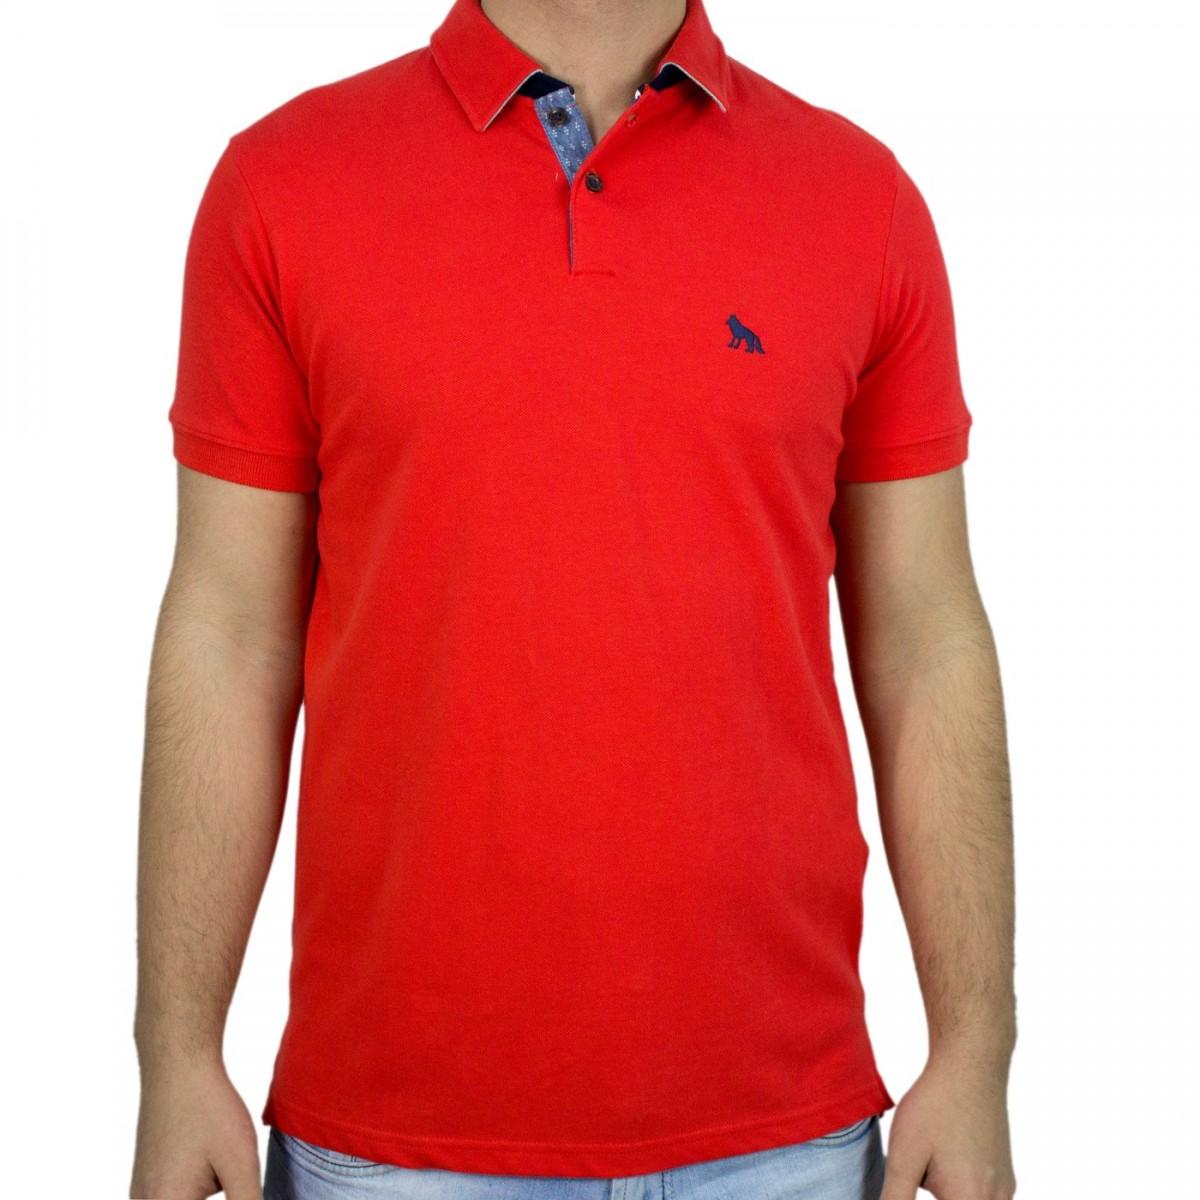 de491fc862 Bizz Store - Camisa Polo Masculina Acostamento Manga Curta